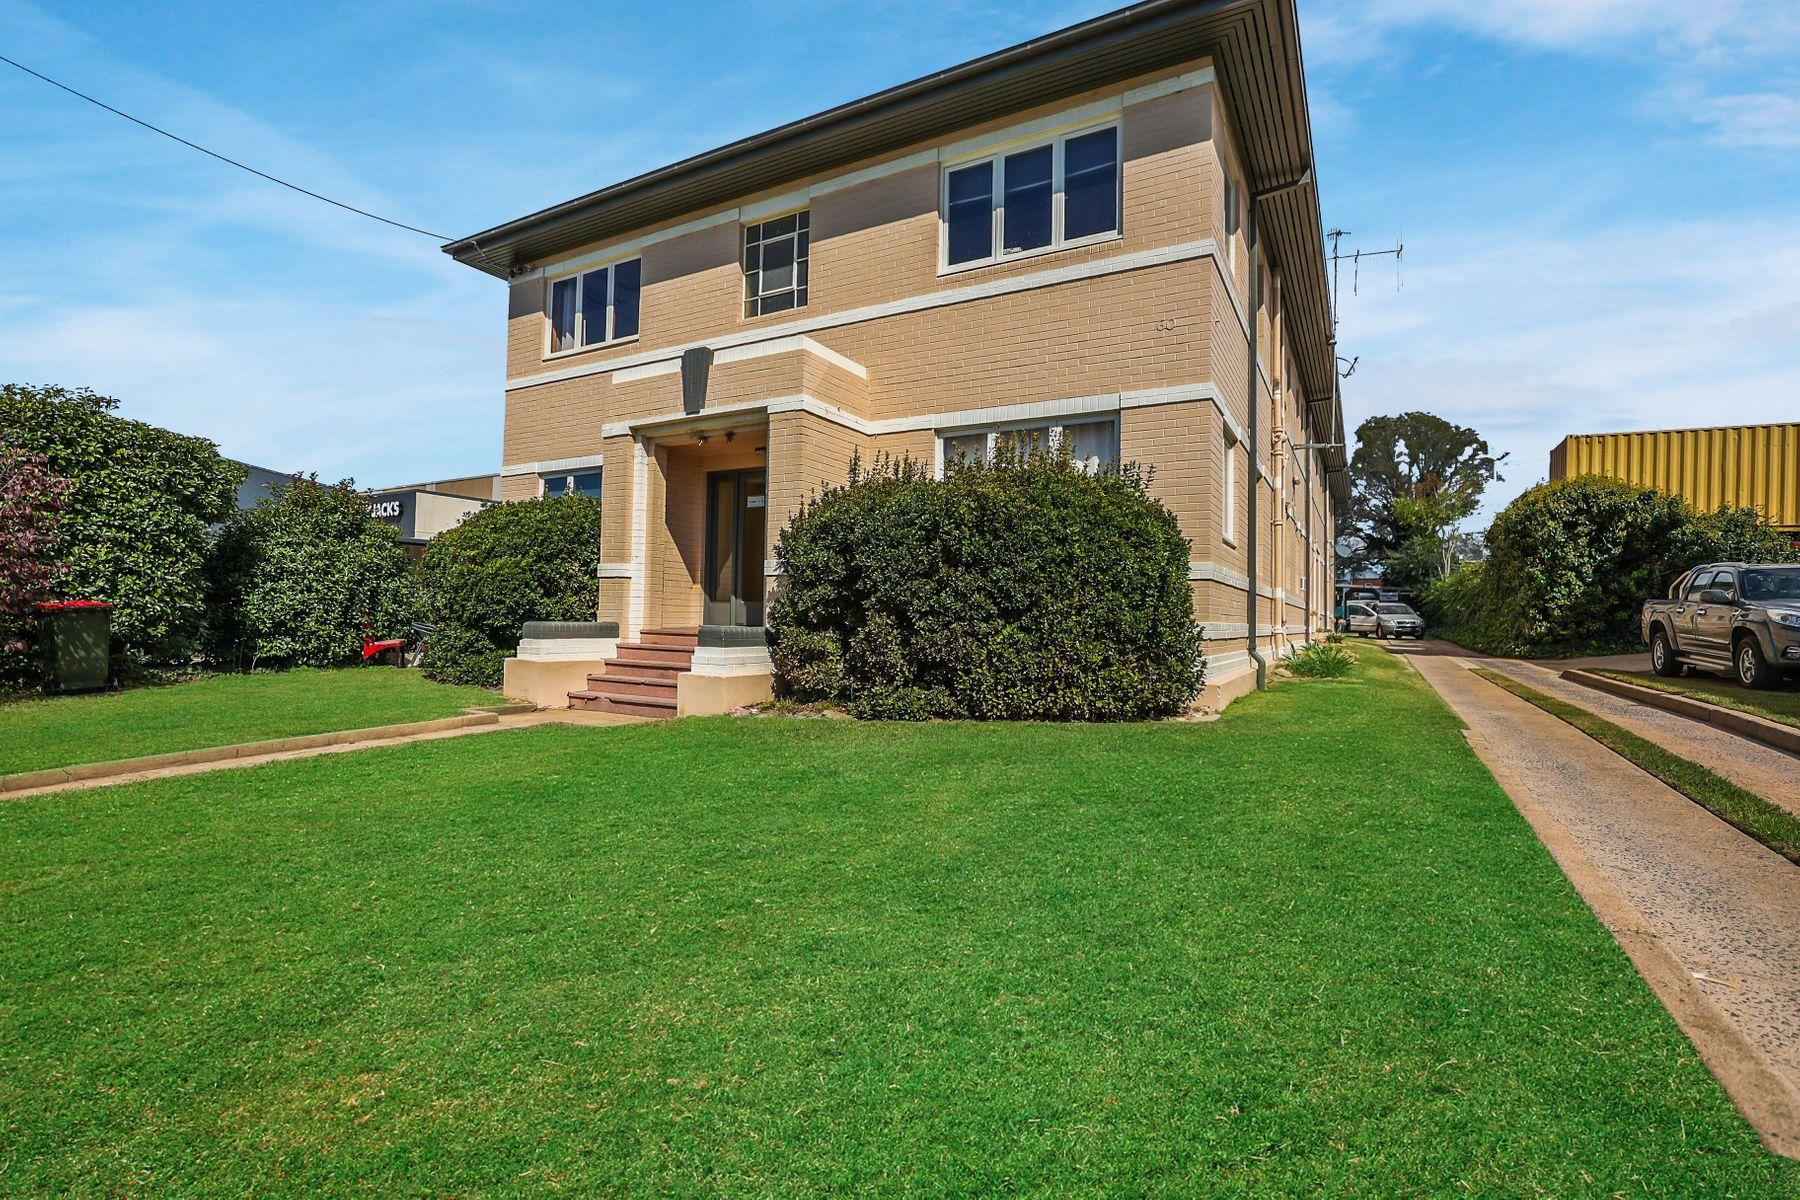 7/60 Durham Street, Bathurst, NSW 2795